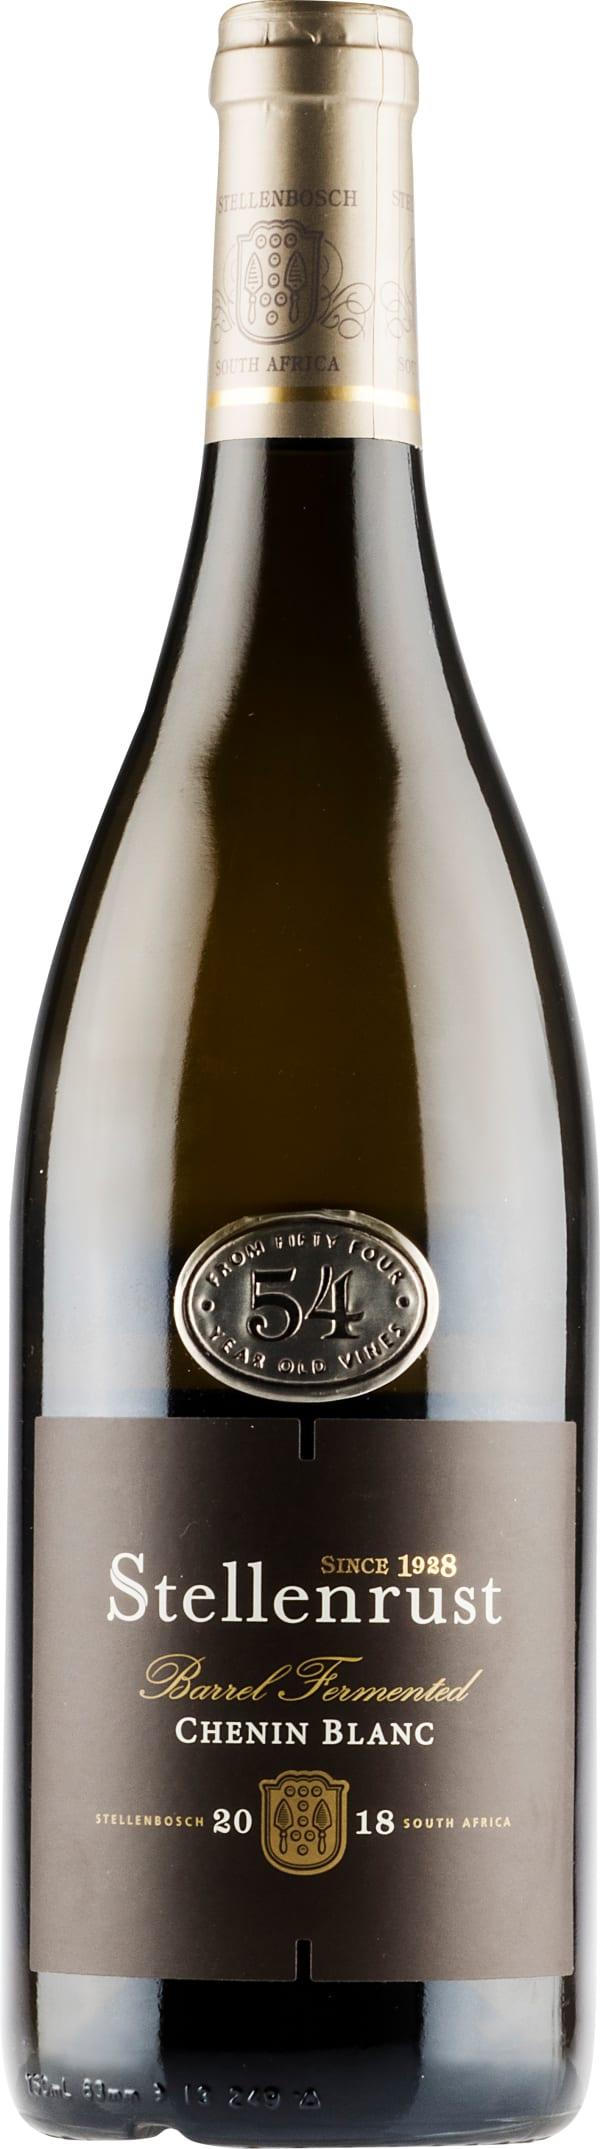 Stellenrust 54 Year Old Vines Barrel Fermented Chenin Blanc 2018